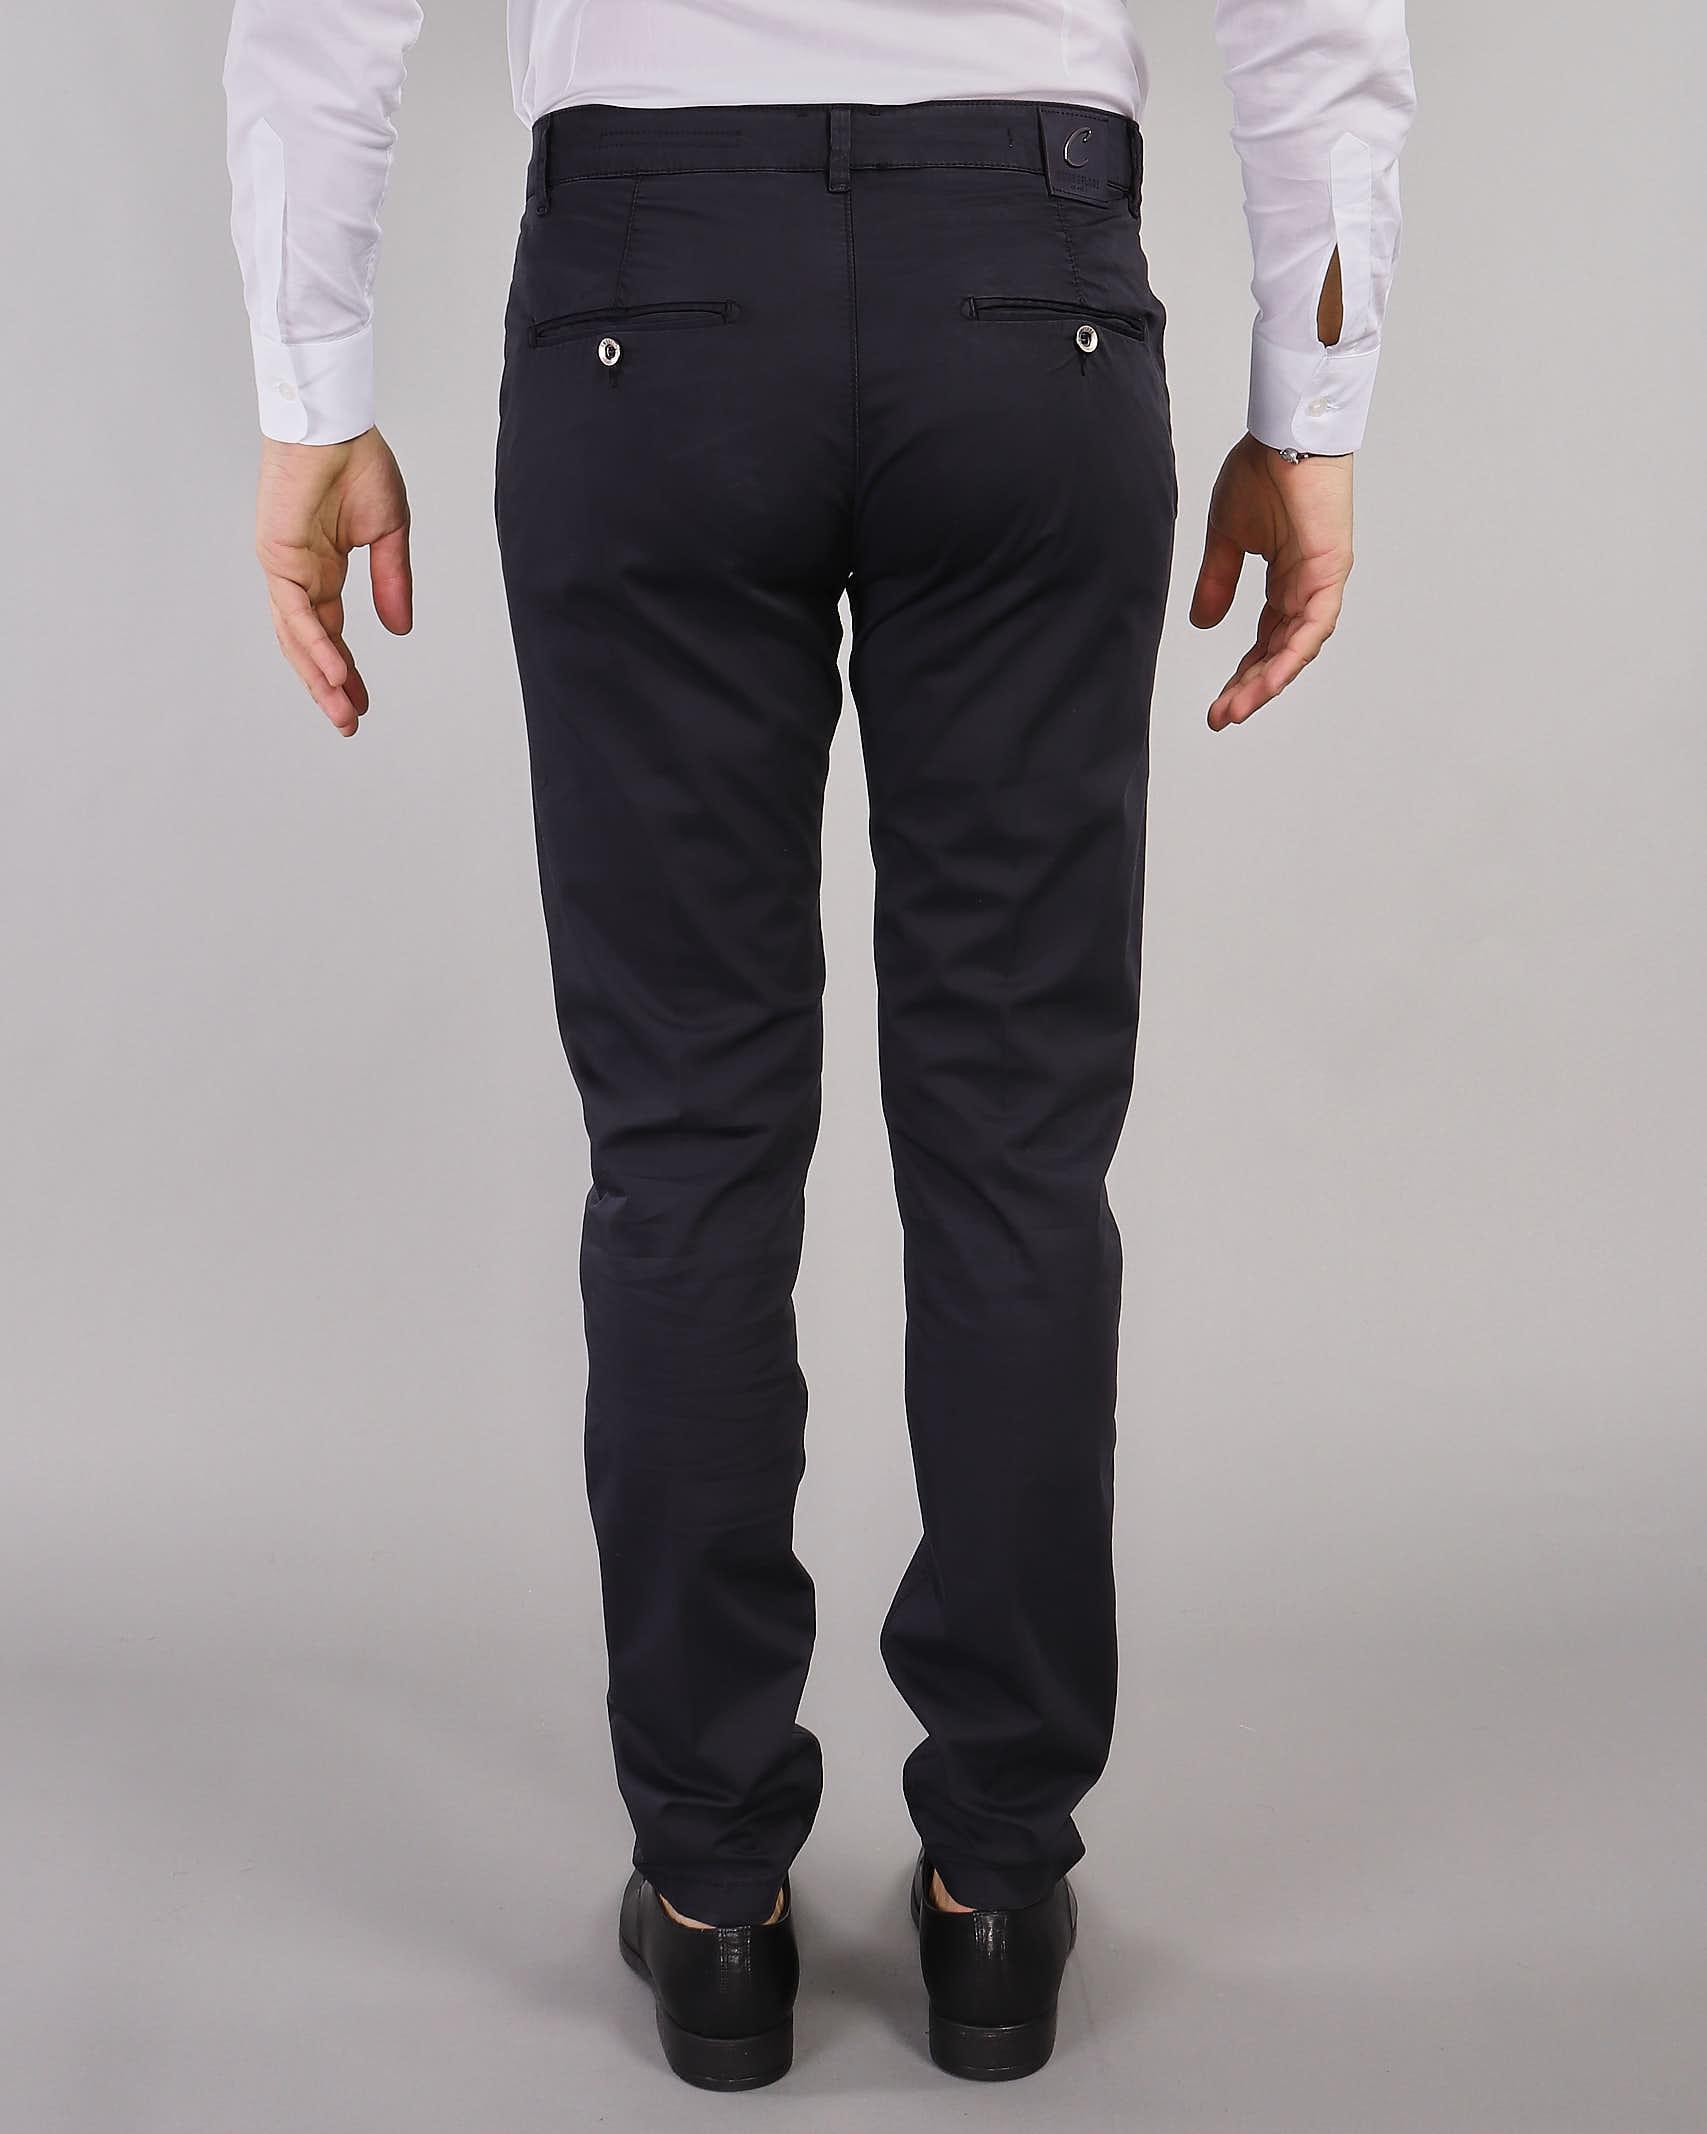 Pantalone tasca america in cotone Camouflage CAMOUFLAGE   Pantalone   CHINOSREY882